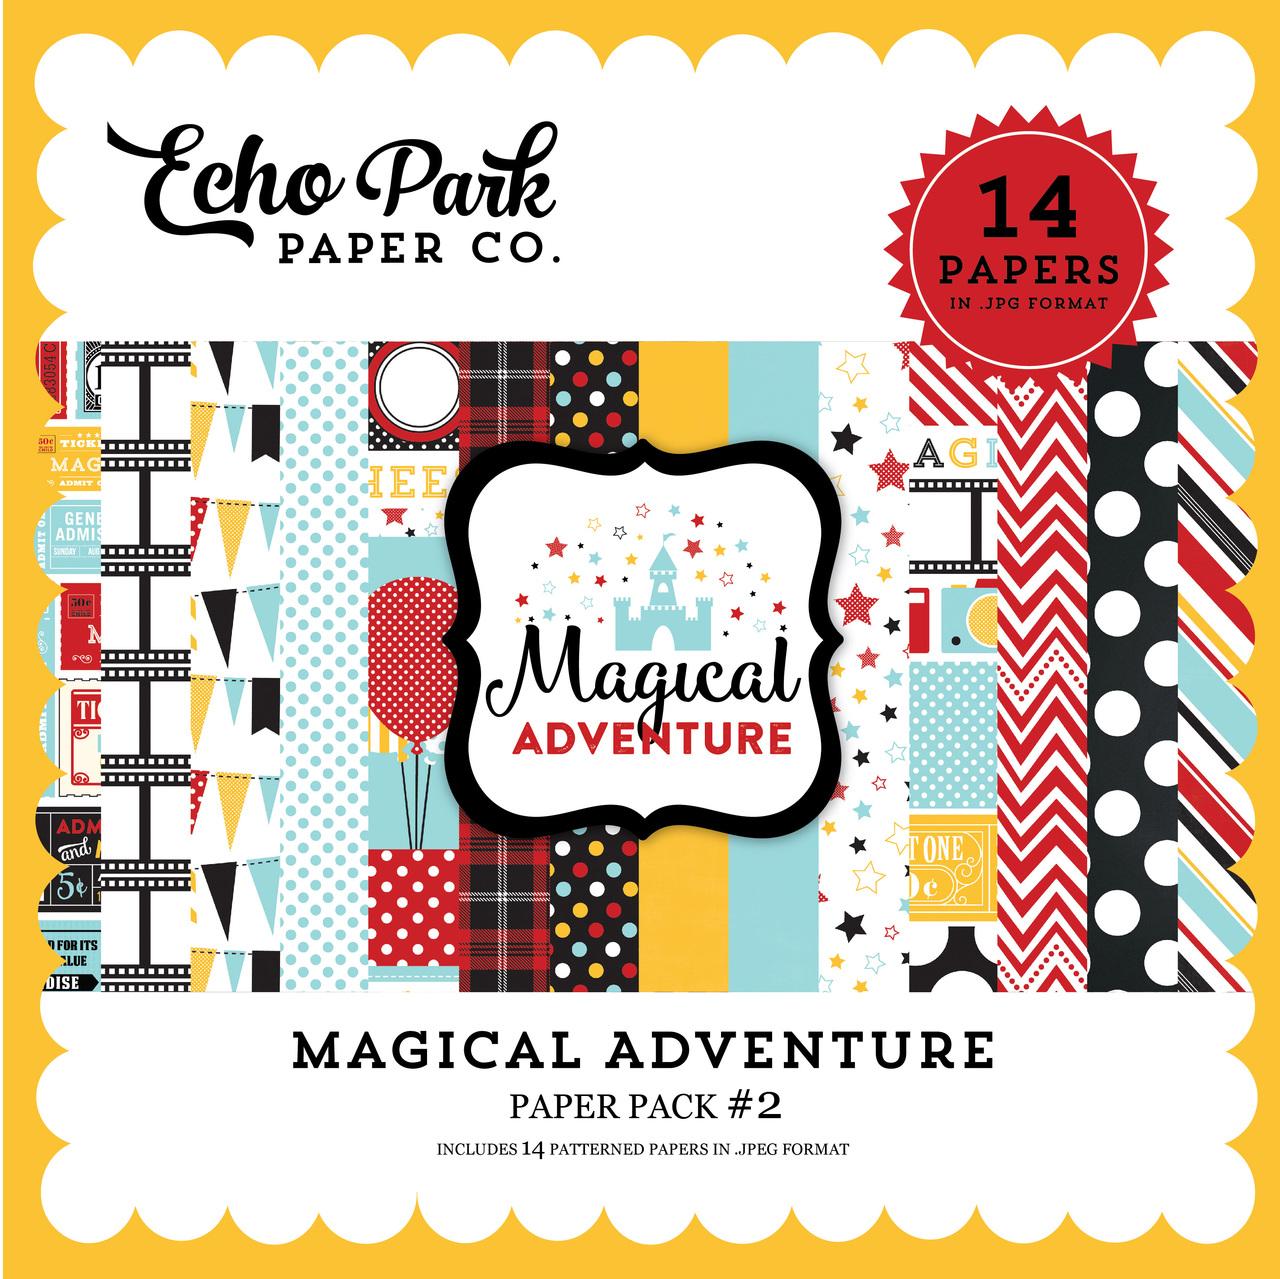 Magical Adventure Paper Pack #2